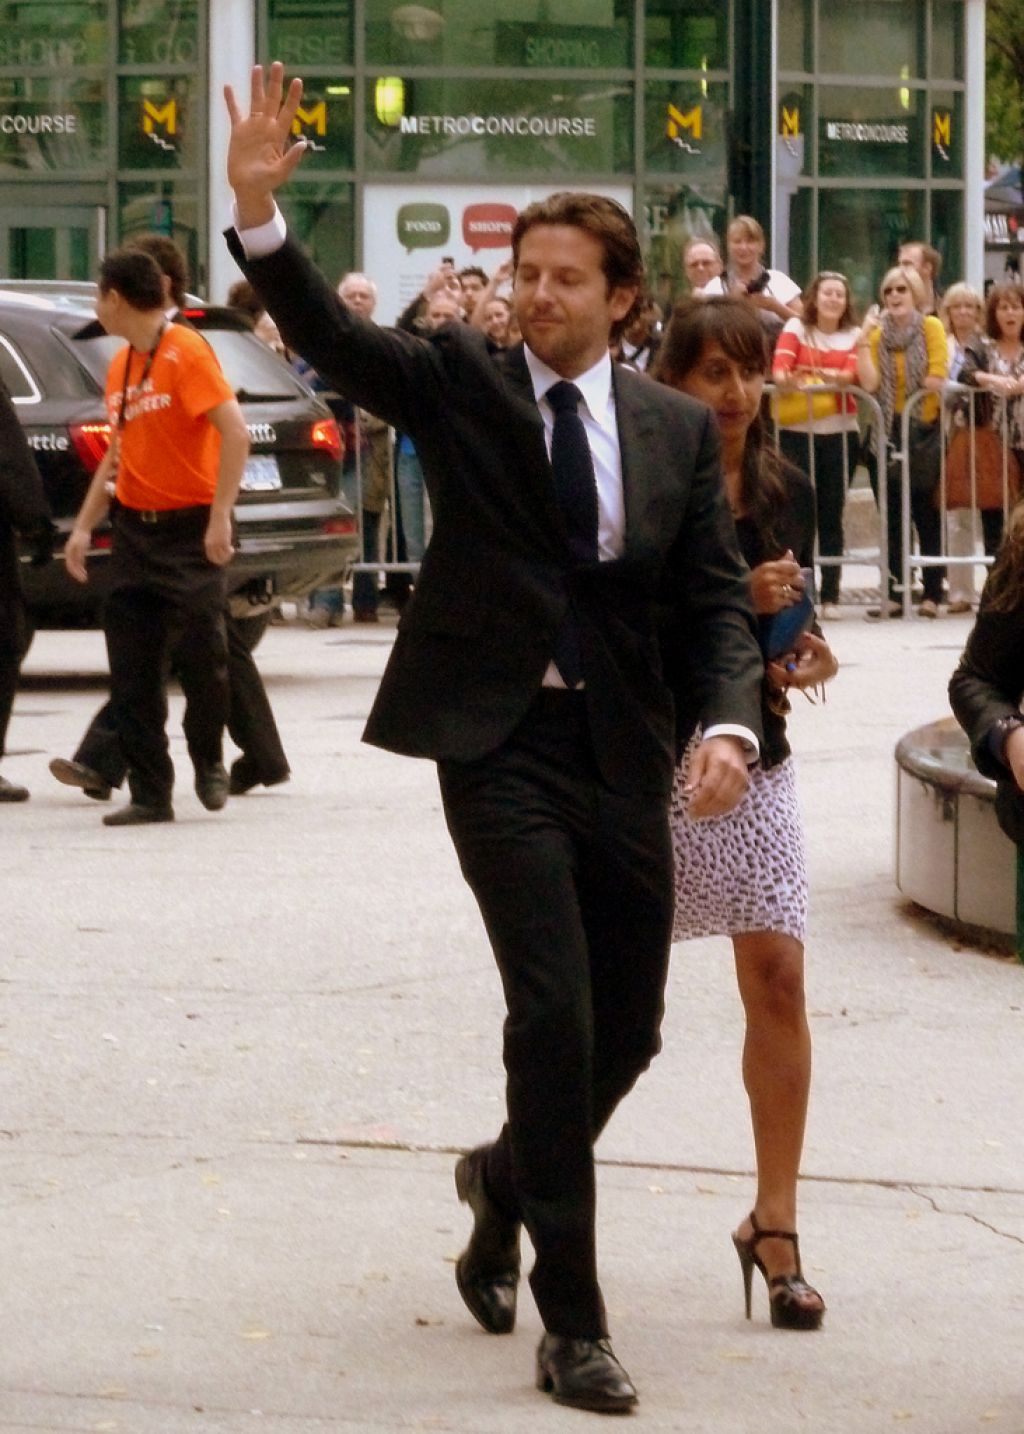 silver linings playbook13 Jennifer Lawrence, Robert De Niro, Bradley Cooper and Chris Tucker  Appeared at The Premiere of Silver Linings Playbook